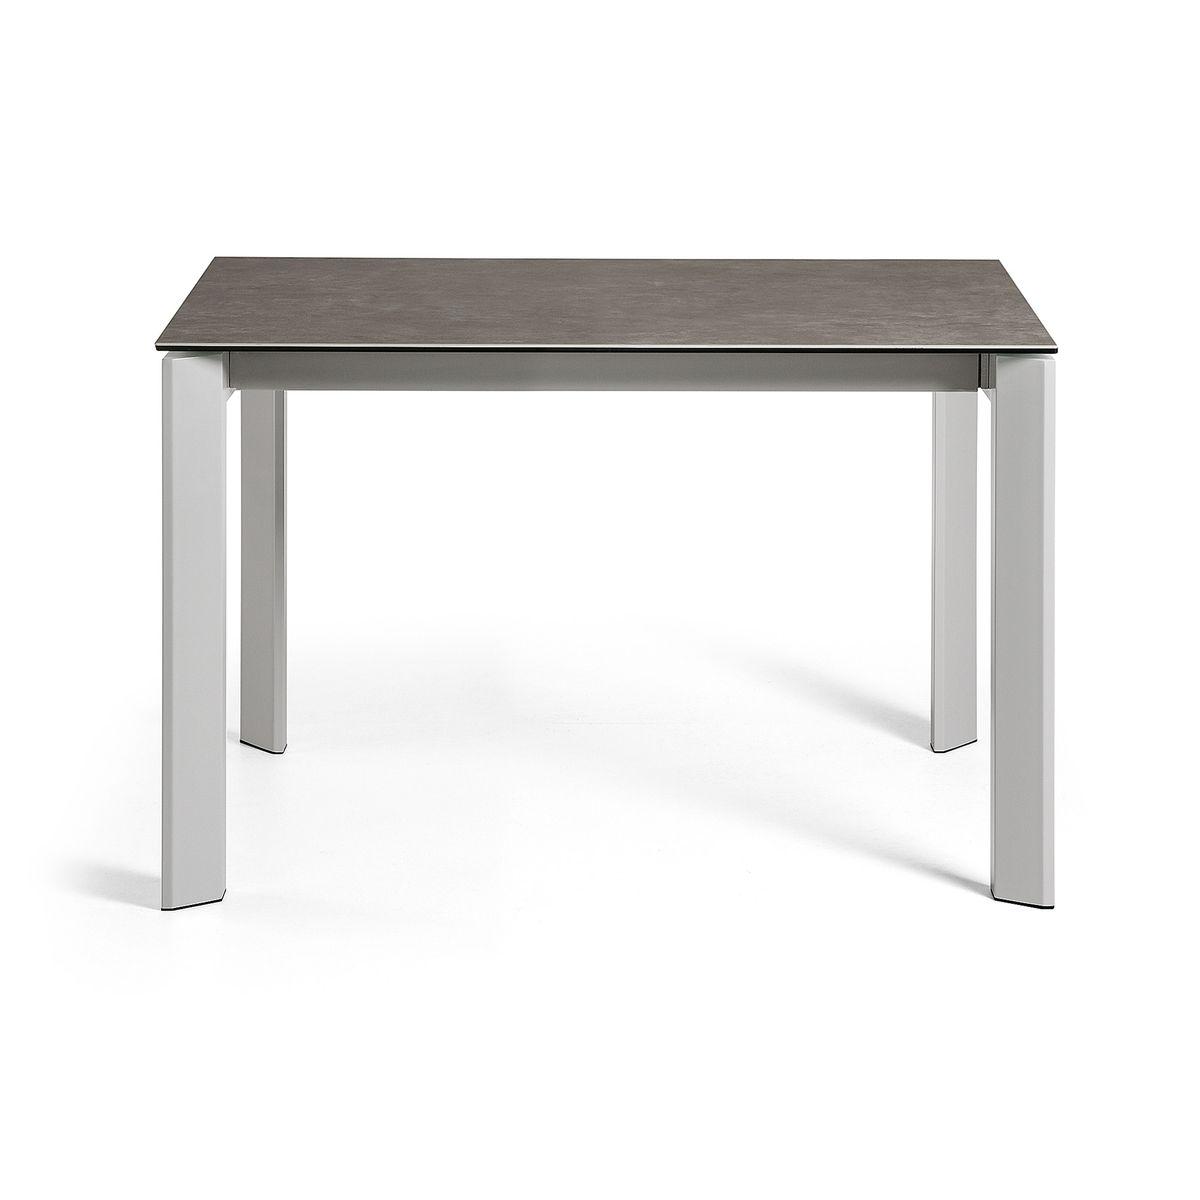 Table Extensible Axis 120 180 Cm Grès Cérame Finition